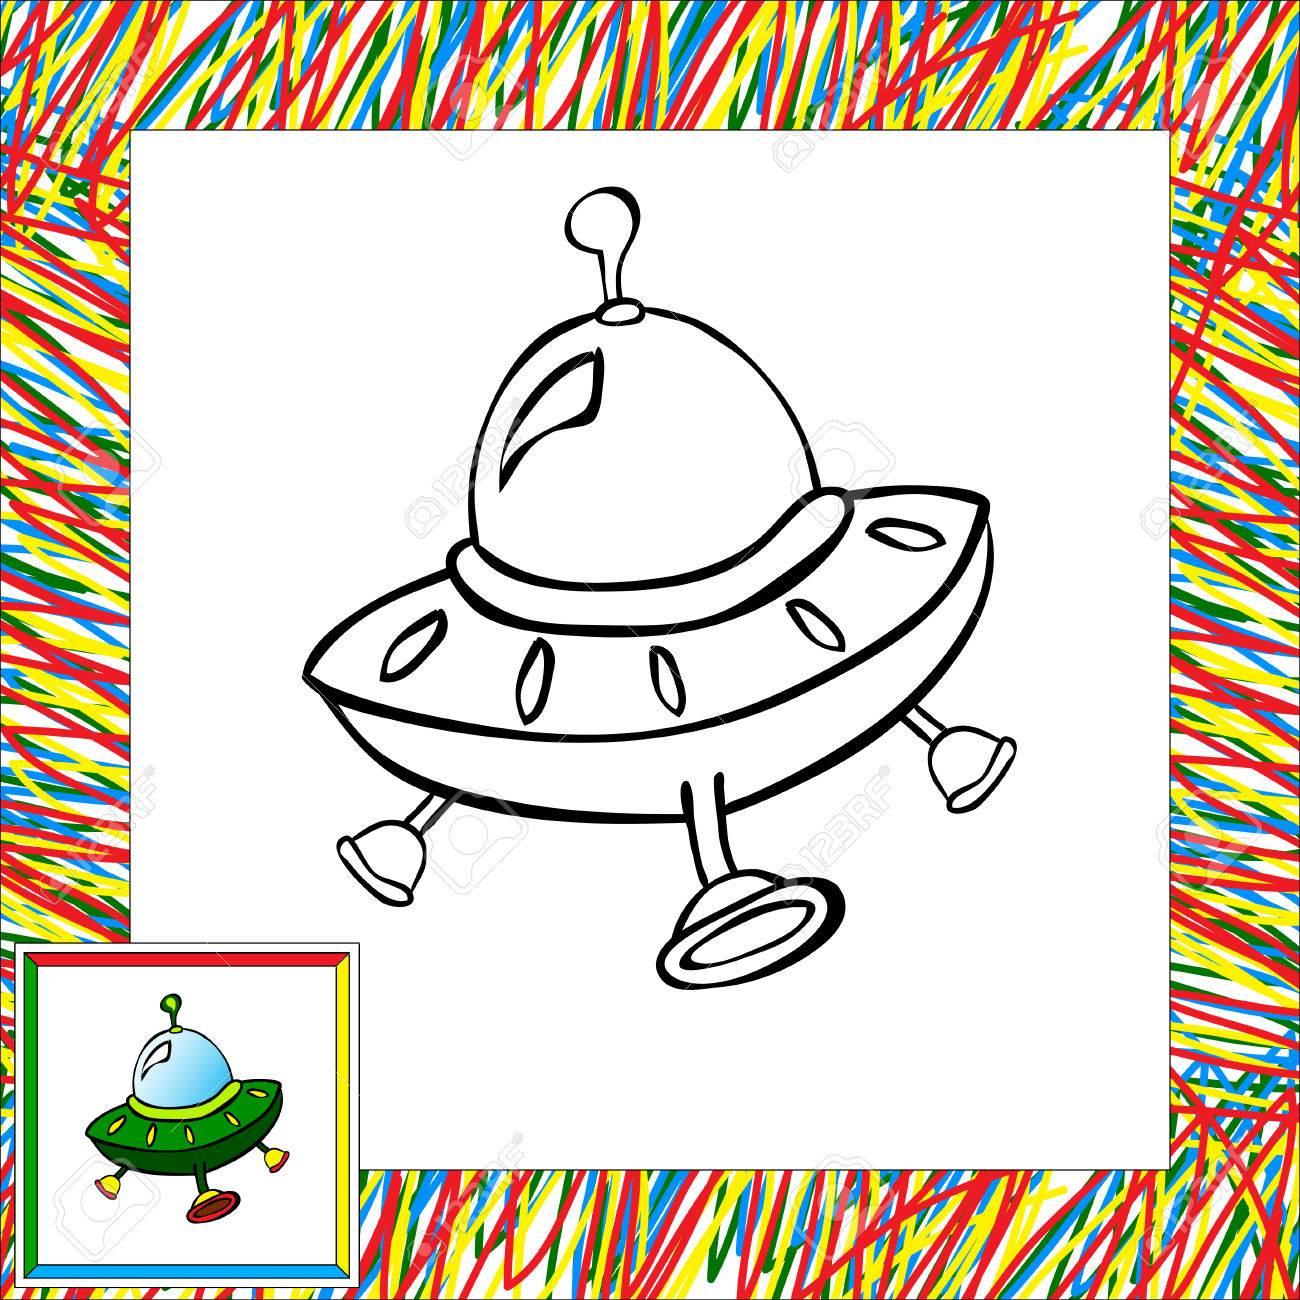 Dorable Cohete De Equipo Para Colorear Ideas - Dibujos de Animales ...